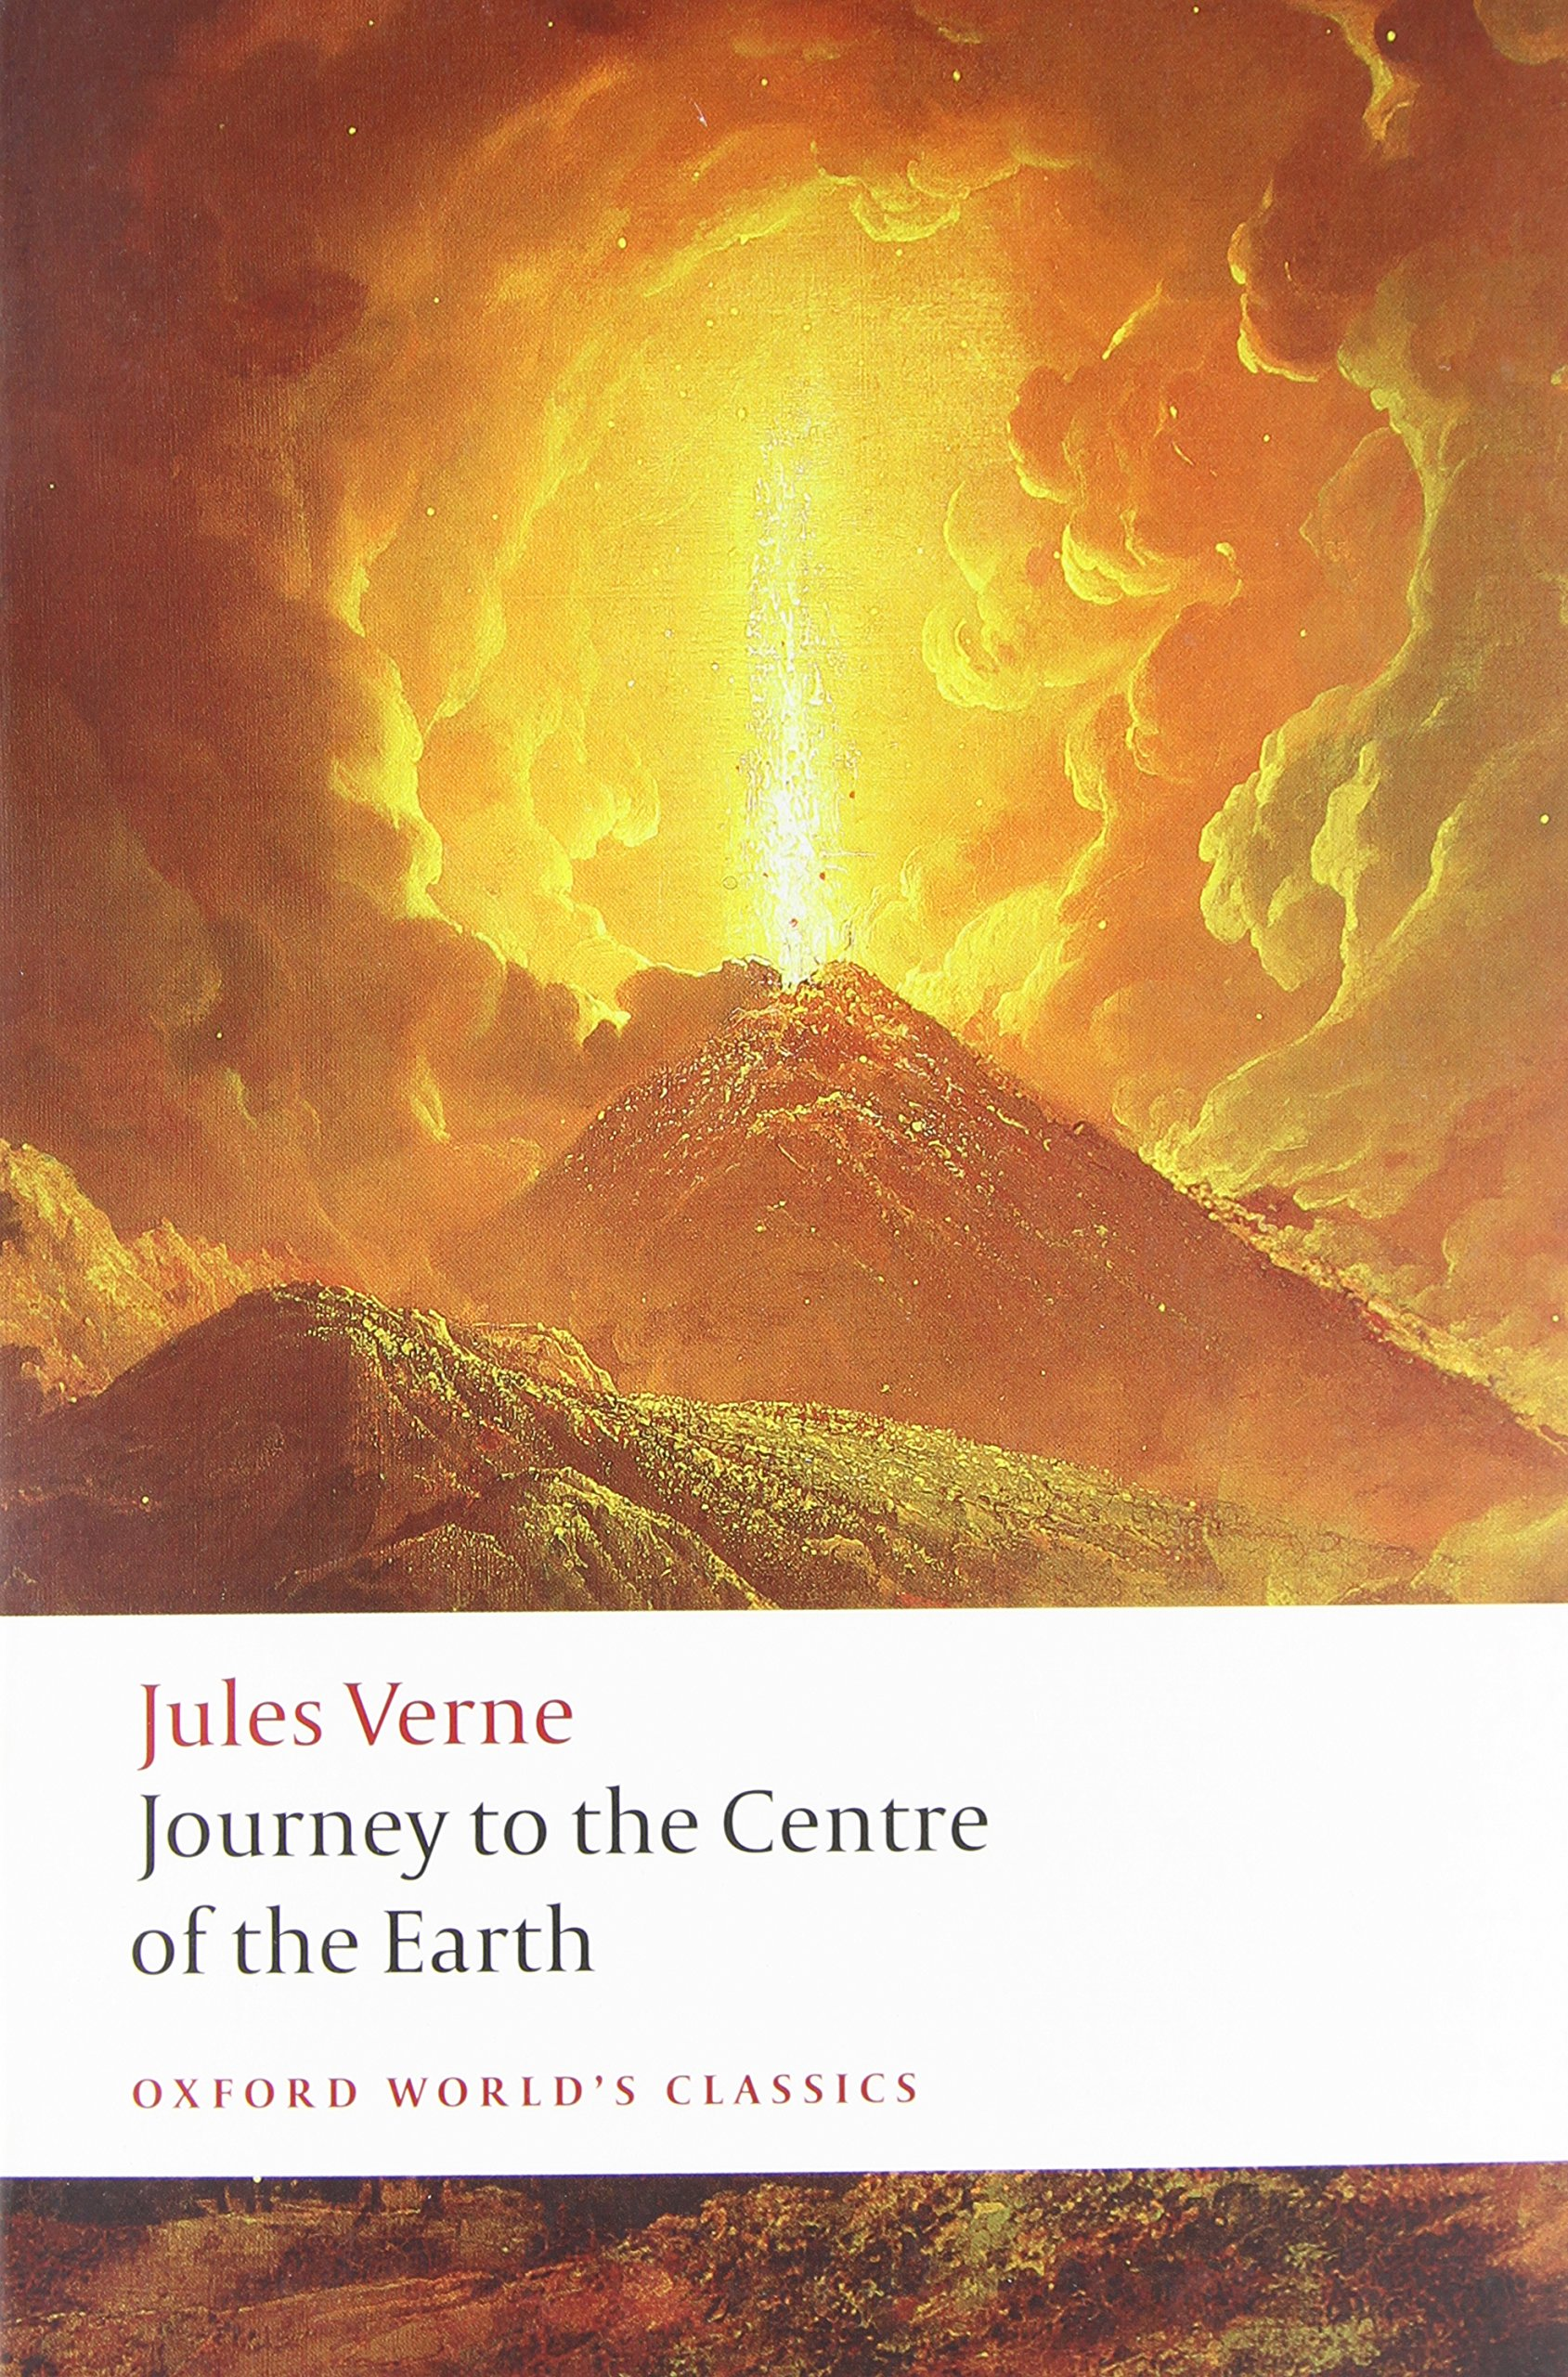 Amazon.com: Journey to the Centre of the Earth (Oxford World's Classics)  (9780199538072): Verne, Jules, Butcher, William: Books